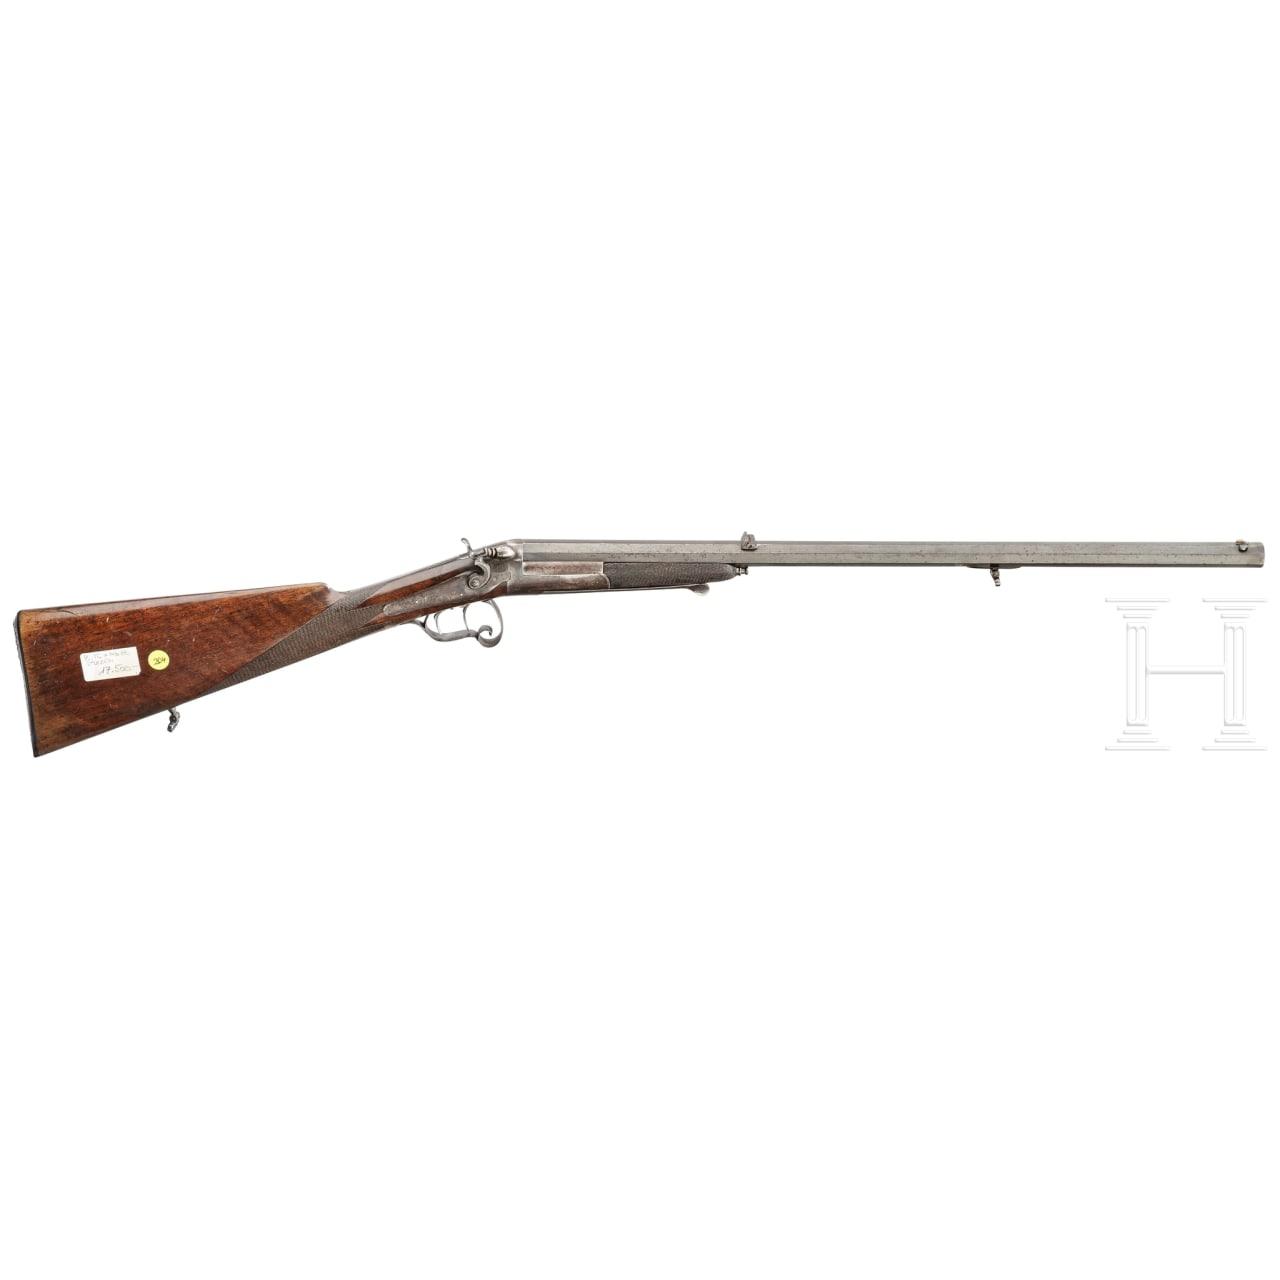 A target rifle with external hammer